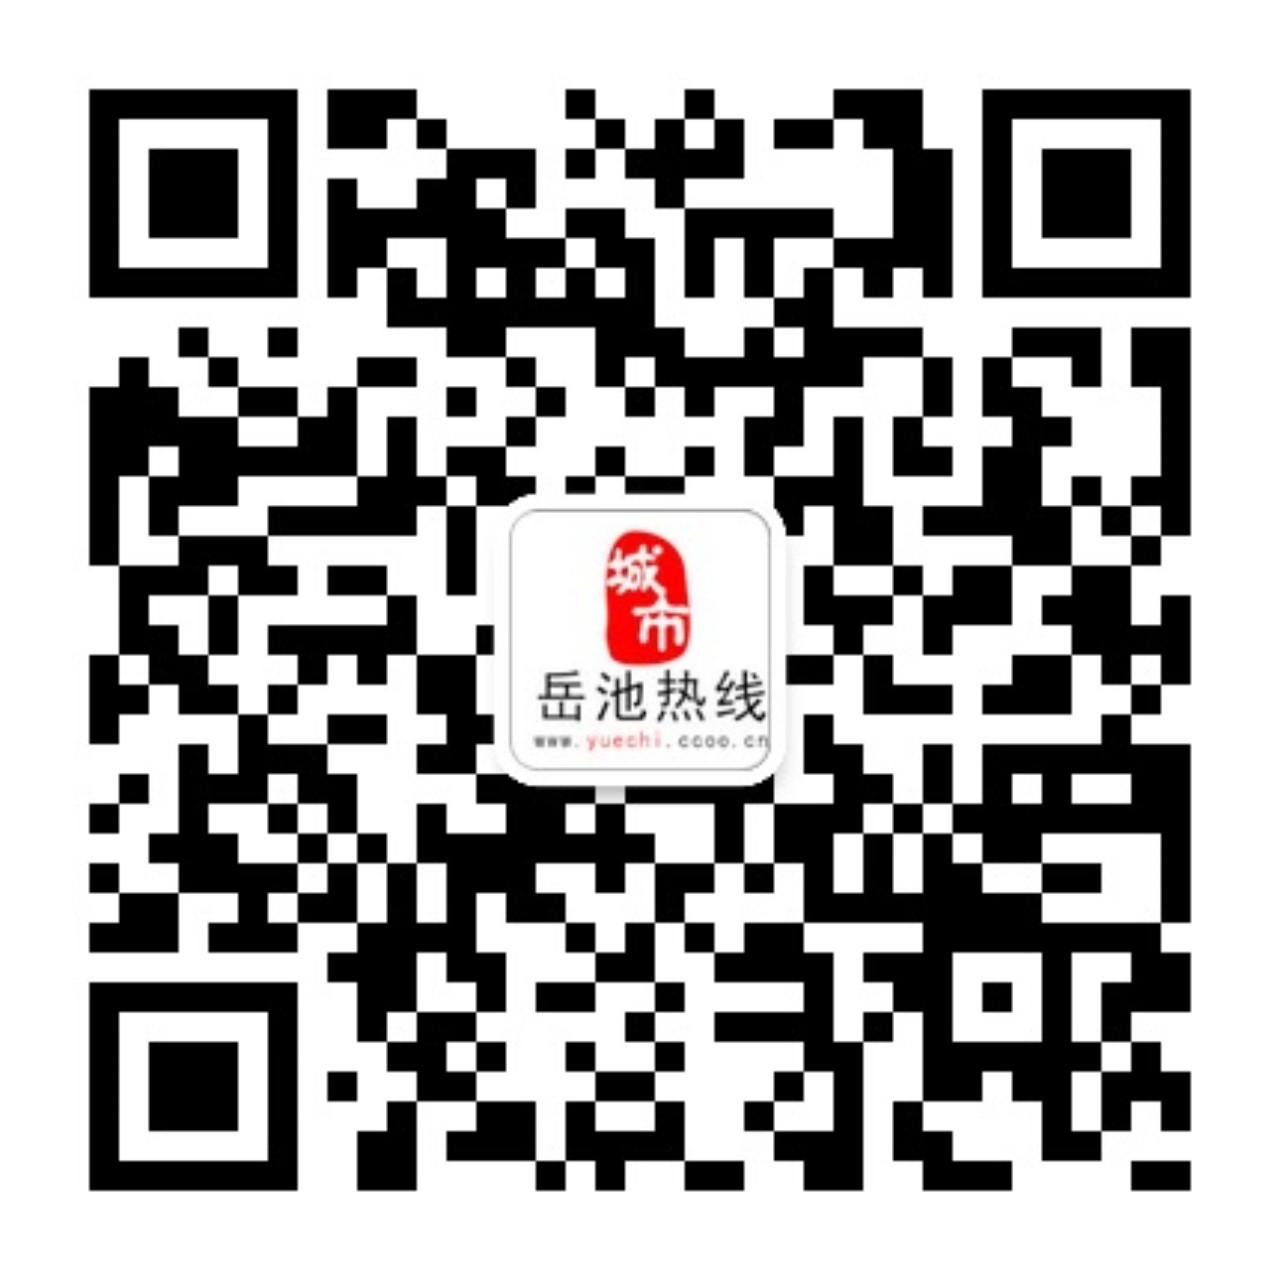 http://p3.pccoo.cn/vote/20160417/2016041715043220591278.jpg